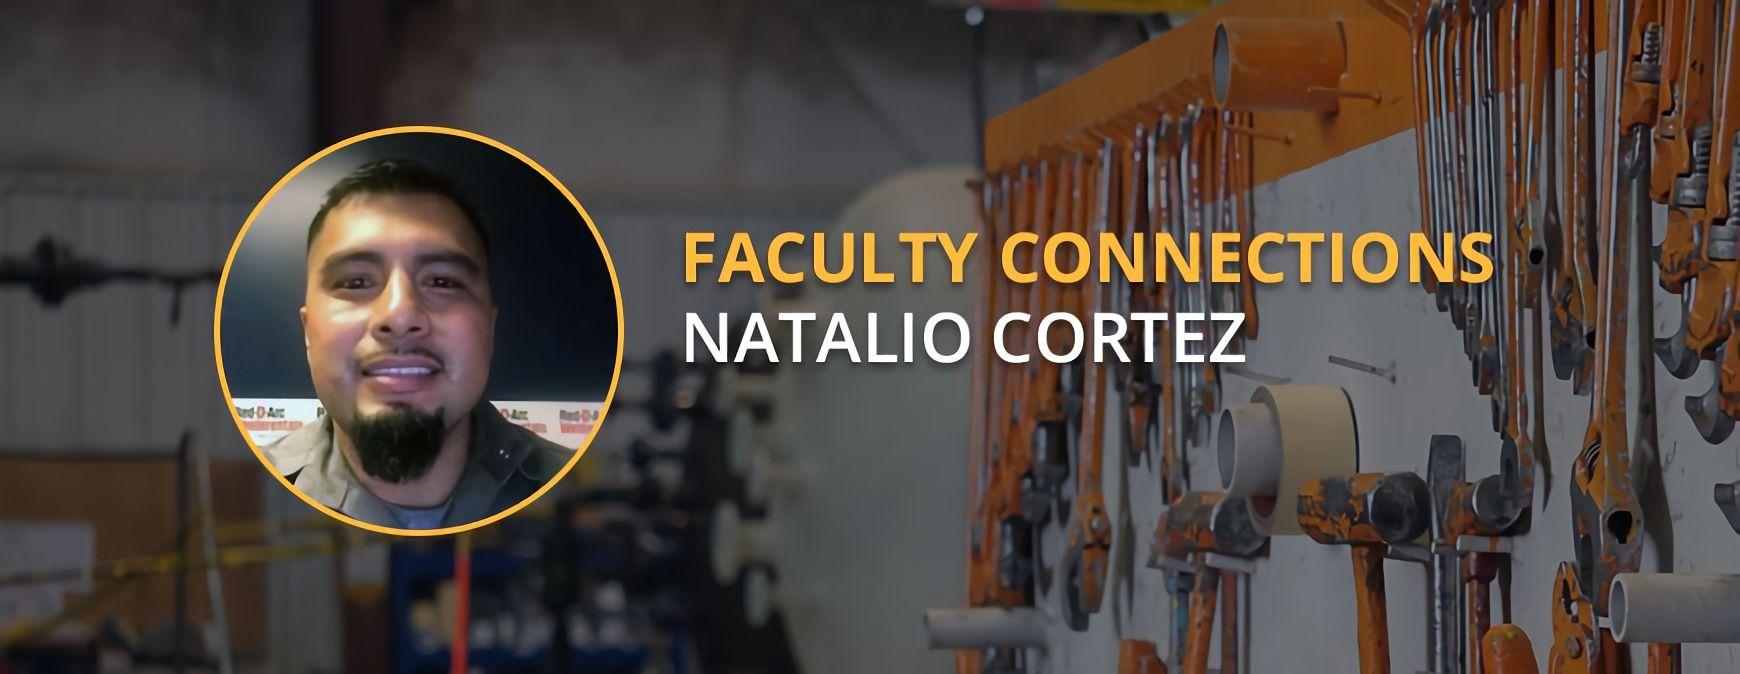 Natalio Cortez faculty connection